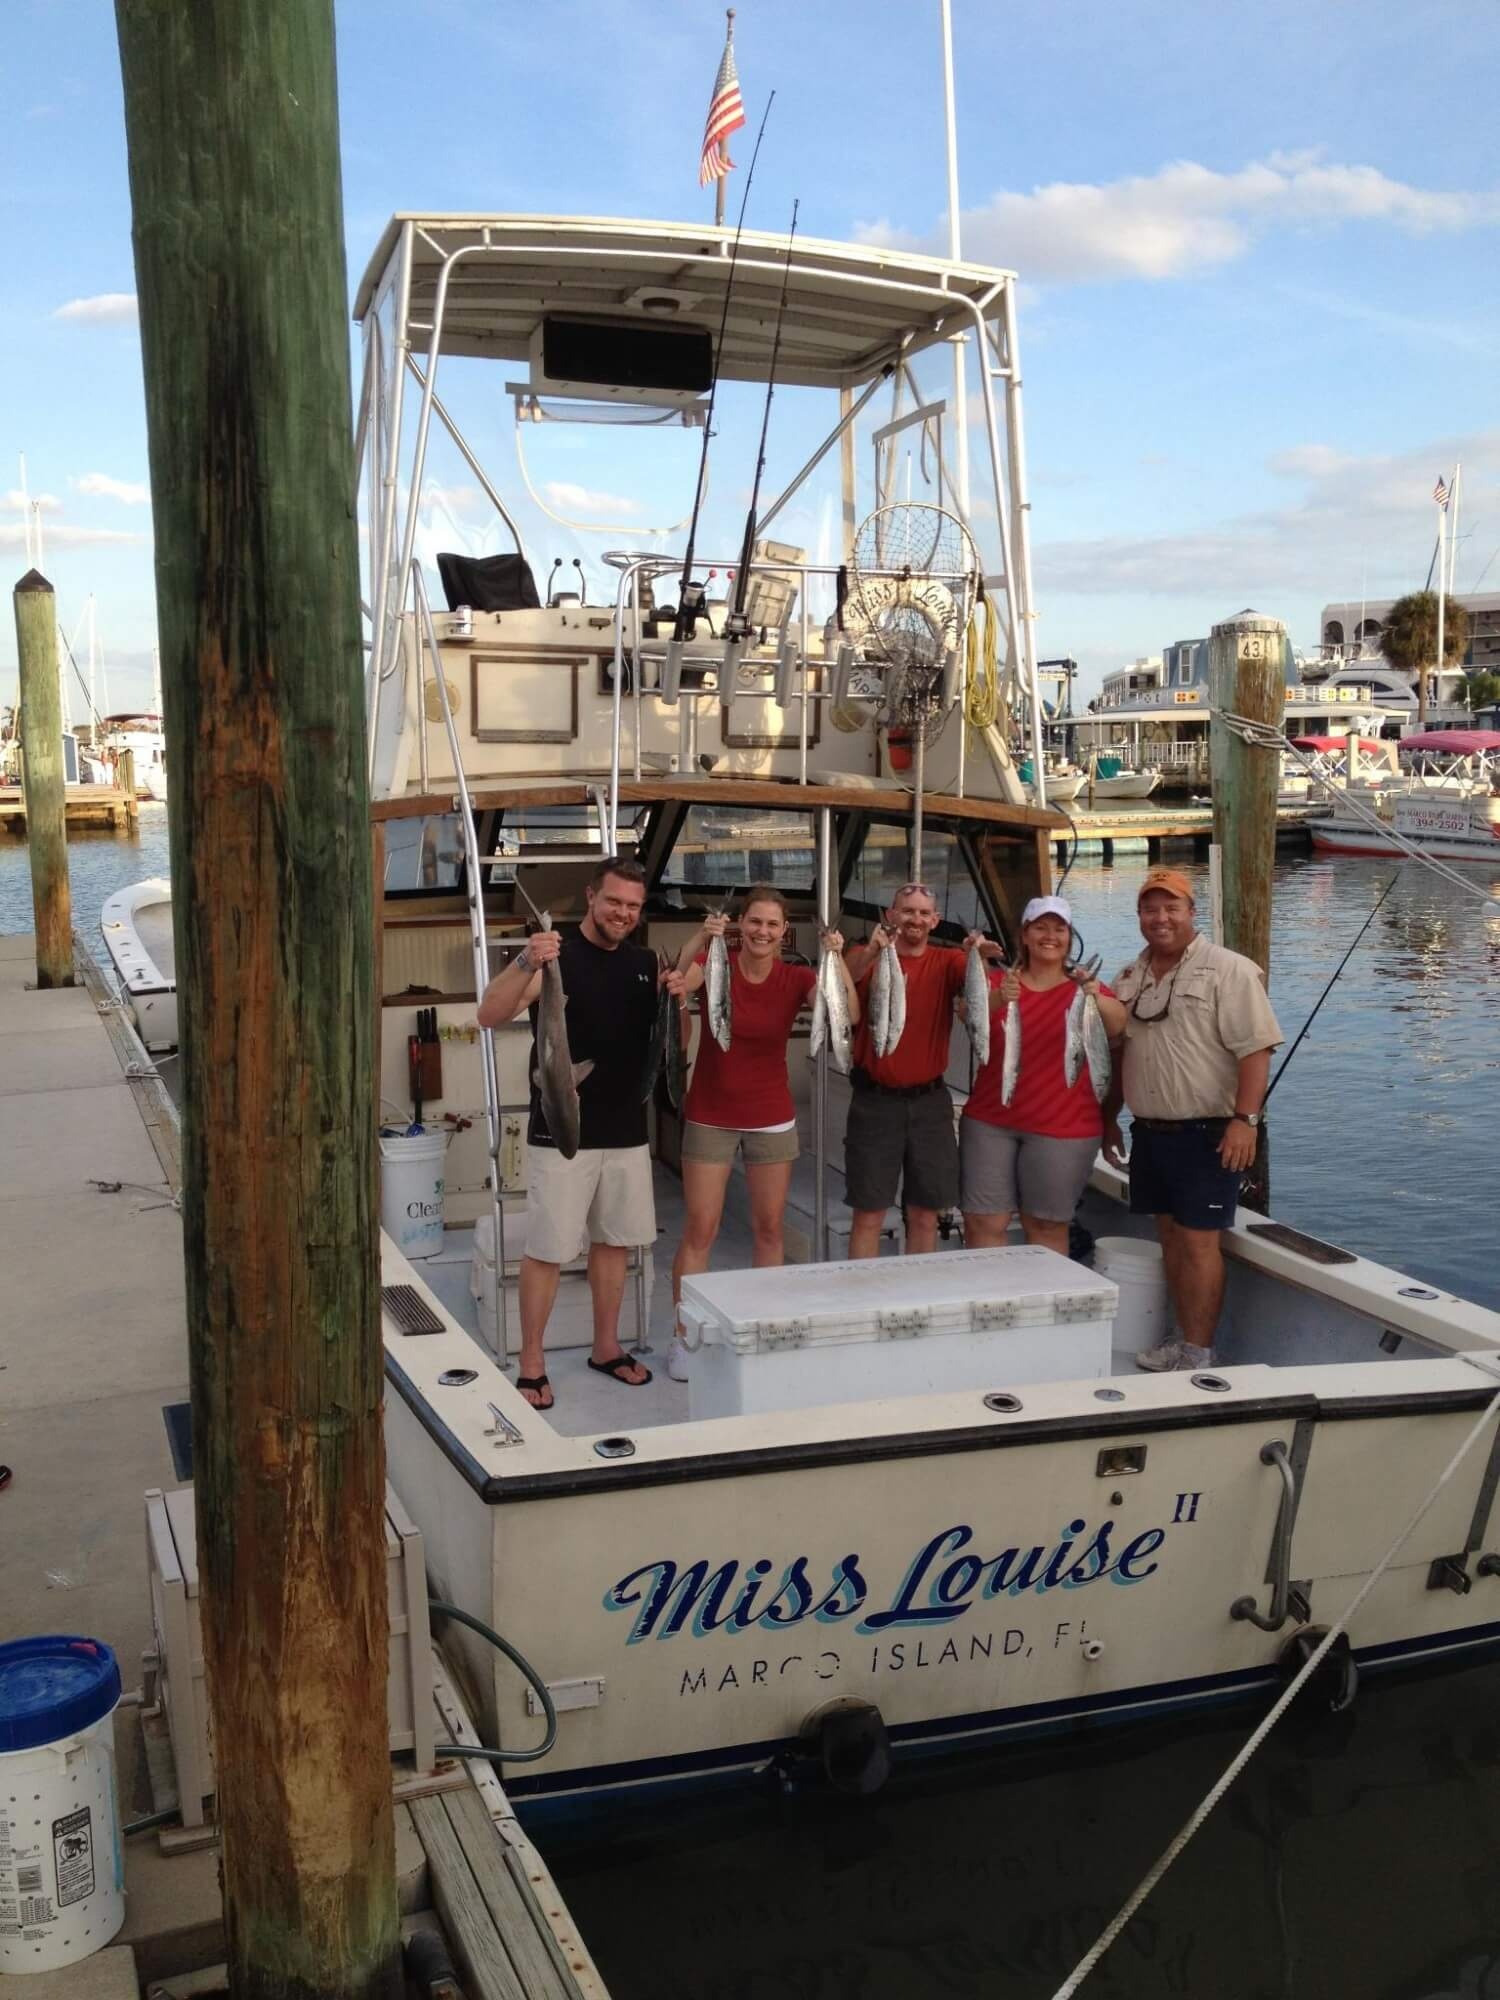 MustDo.com | Sunshine Tours & Fishing Charters aboard Miss Louise Marco Island, Florida.